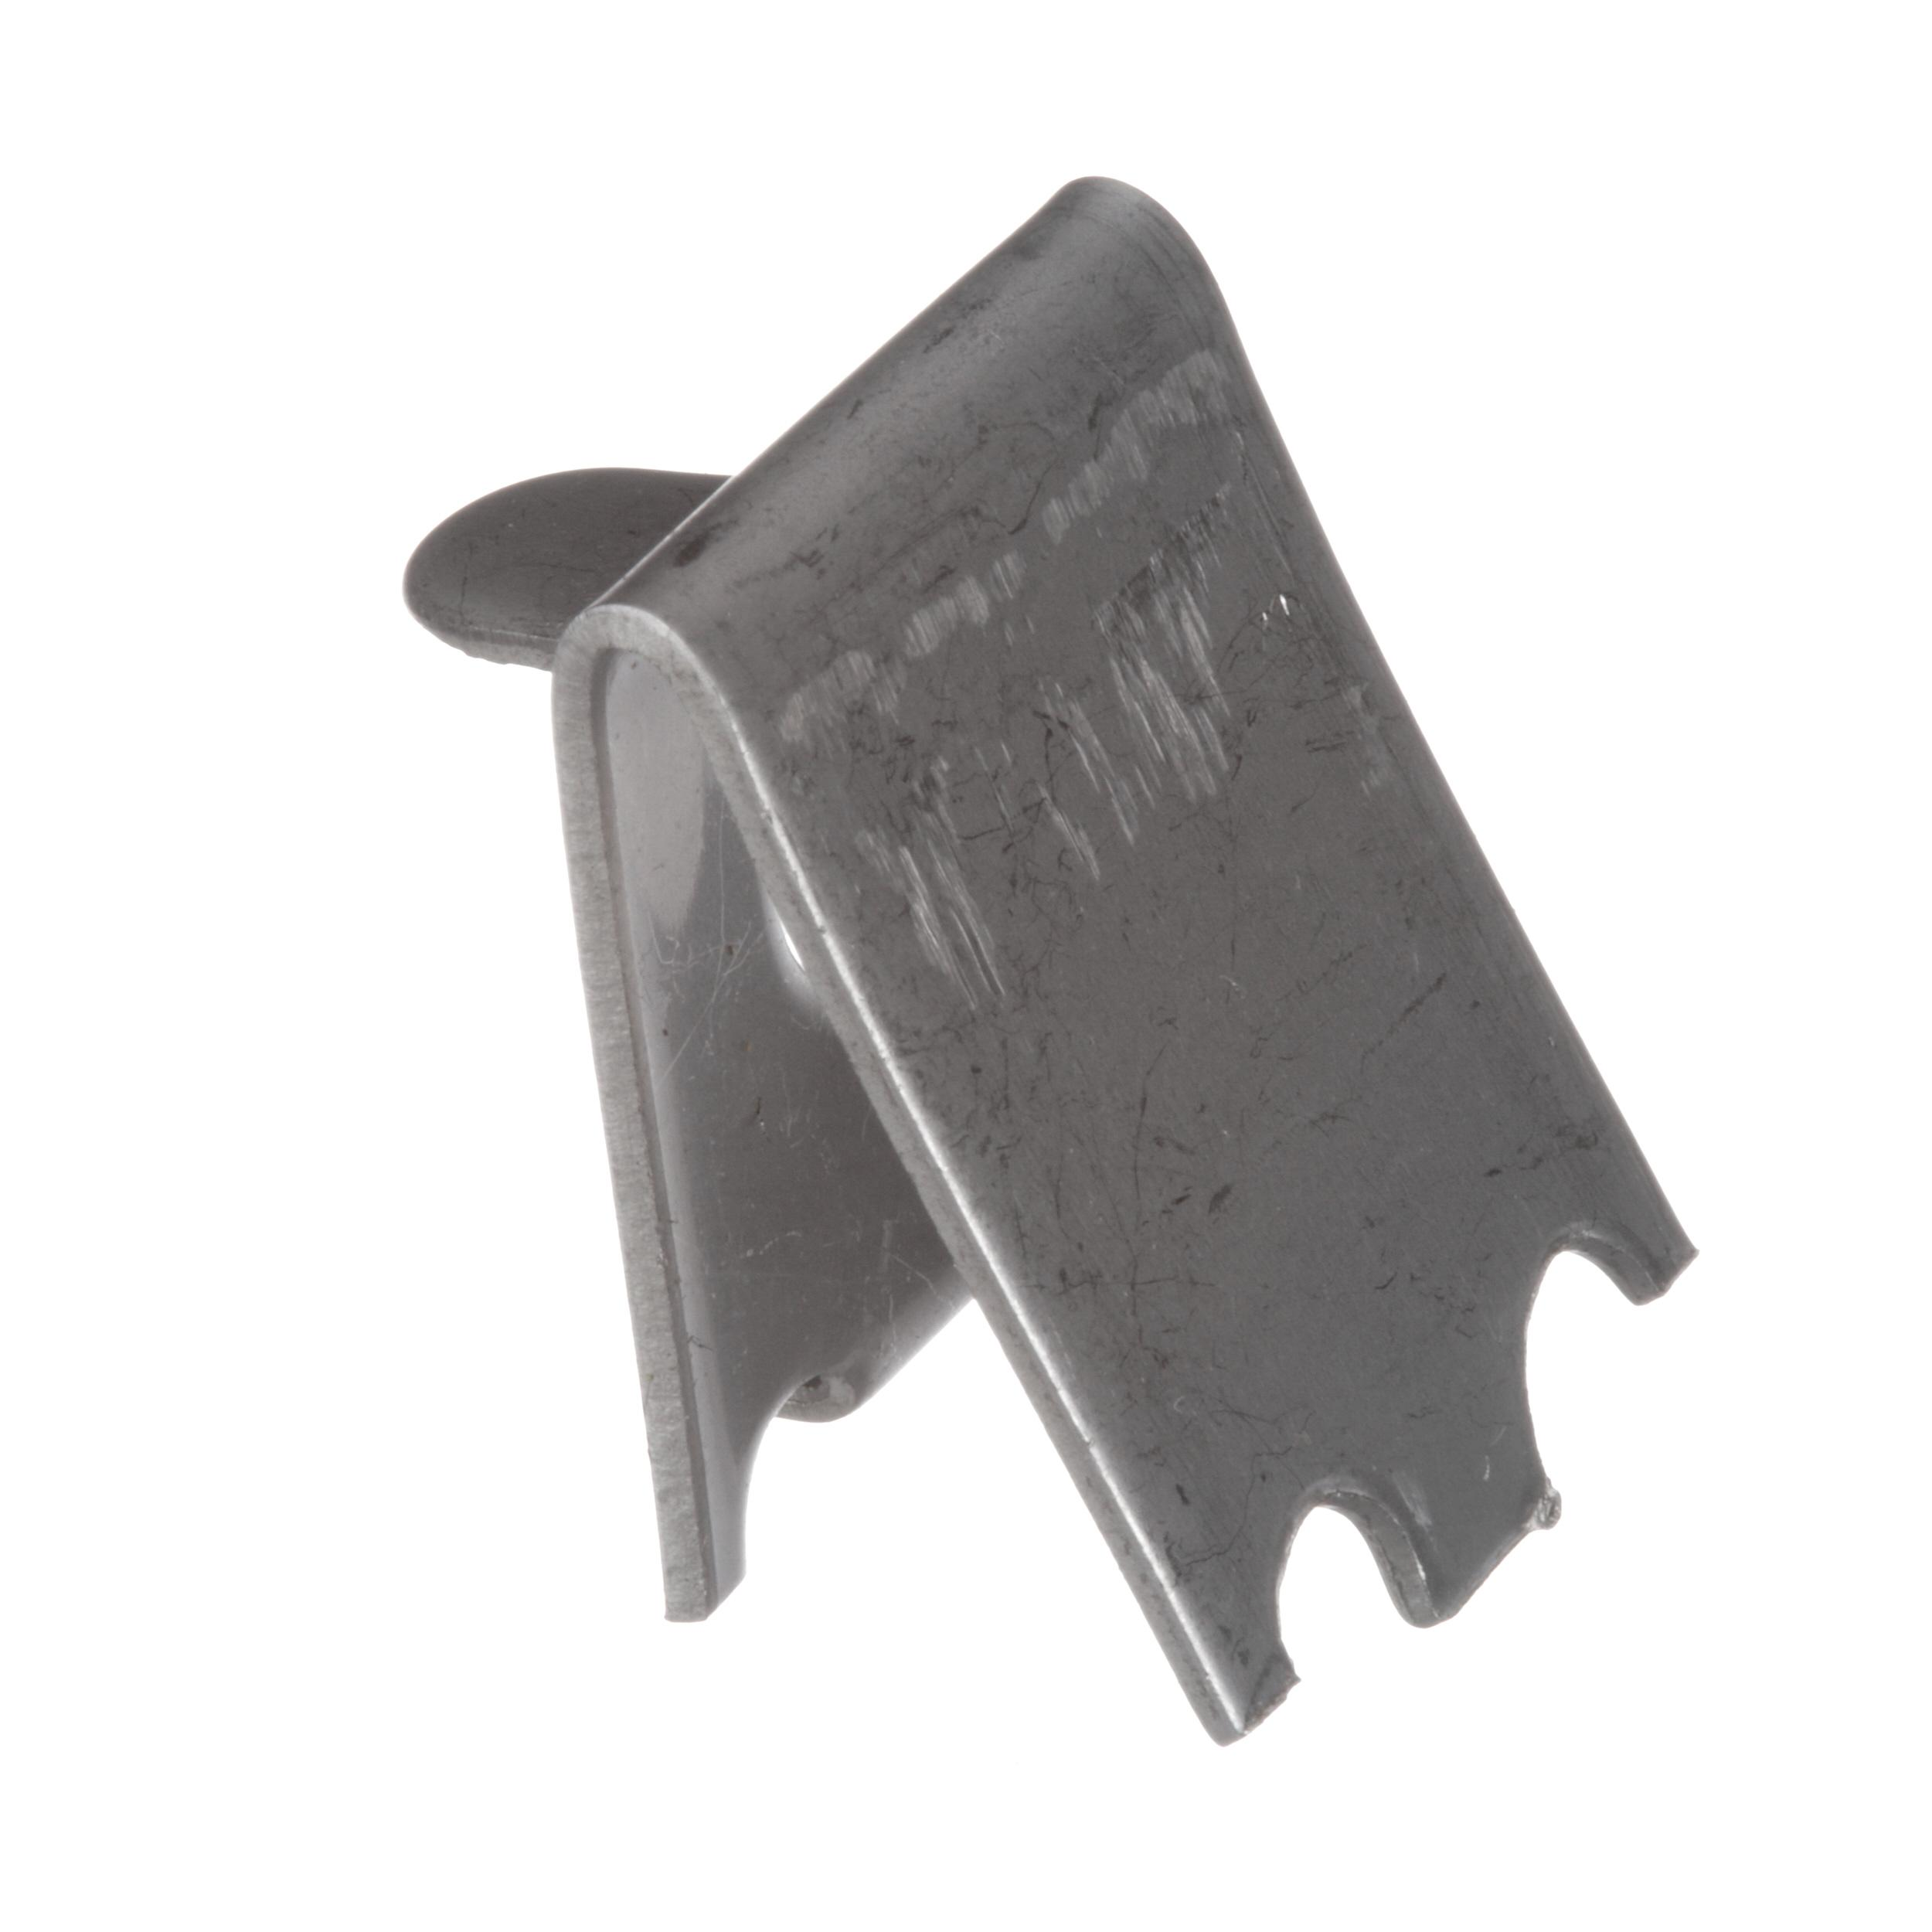 CRIOTEC BRACKET INOXS-304 22MM WIDE